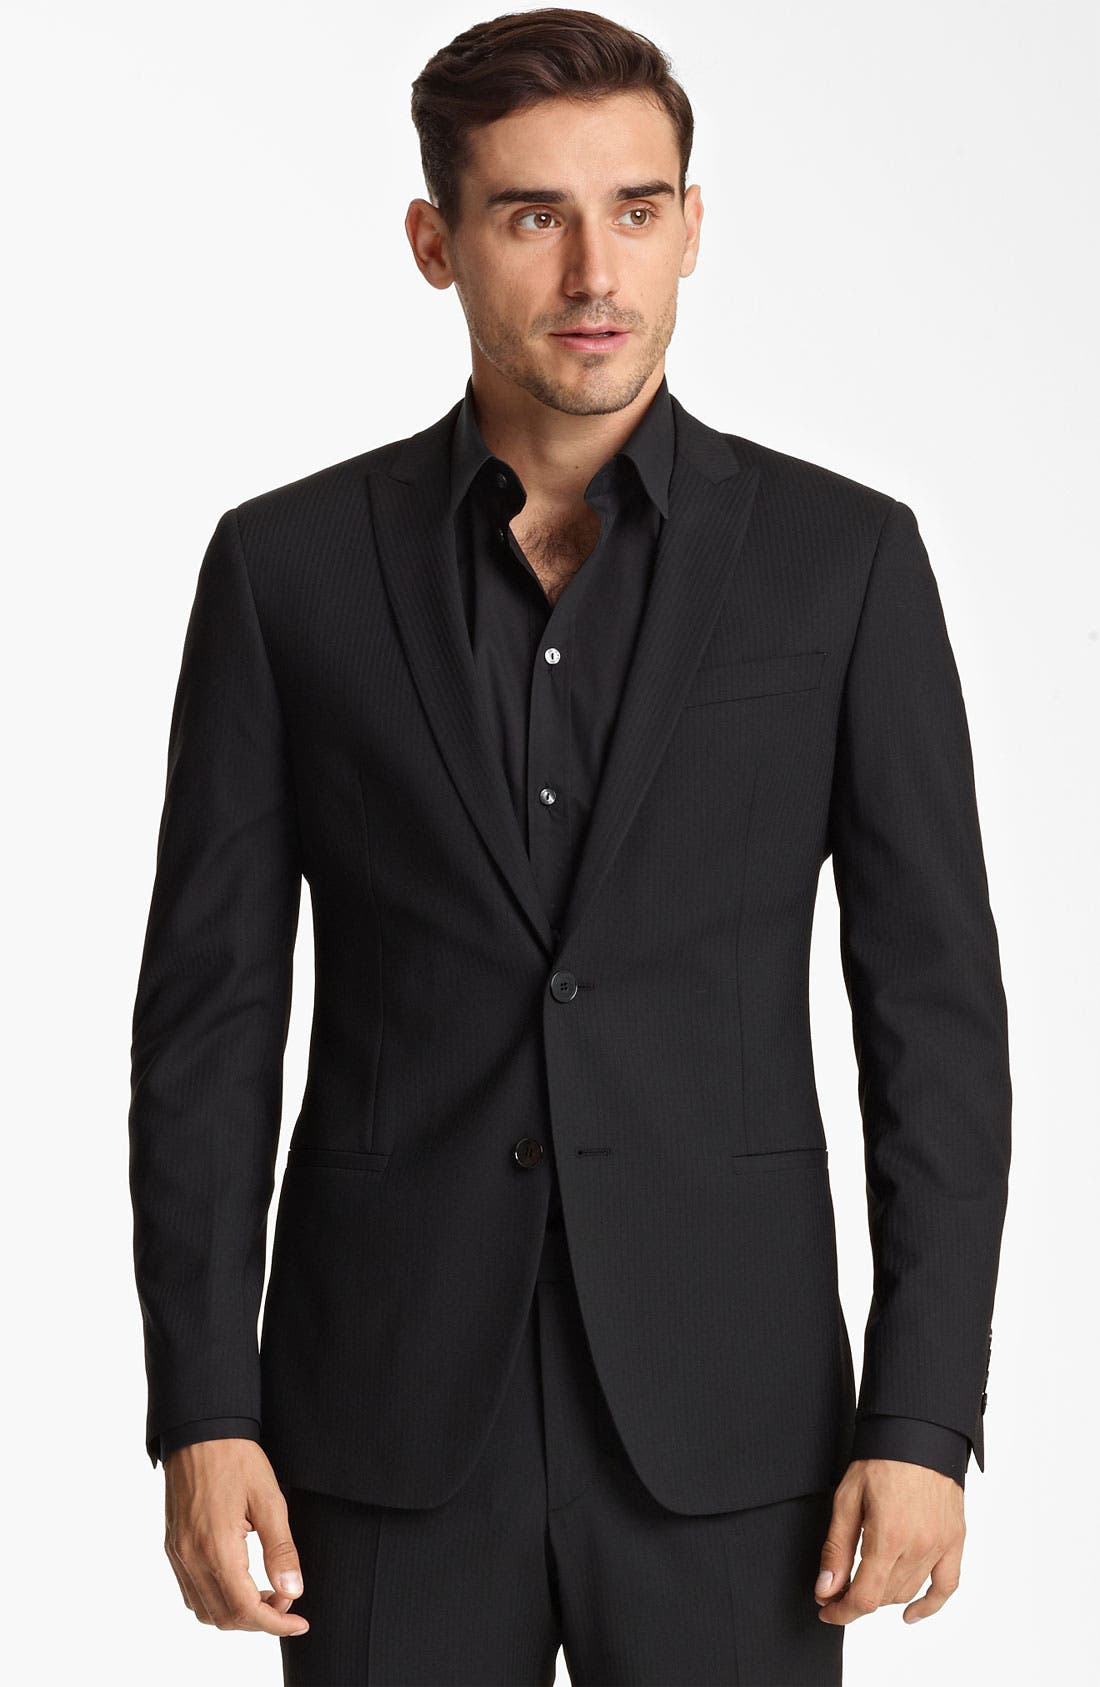 Alternate Image 1 Selected - Dolce&Gabbana Tonal Stripe Suit